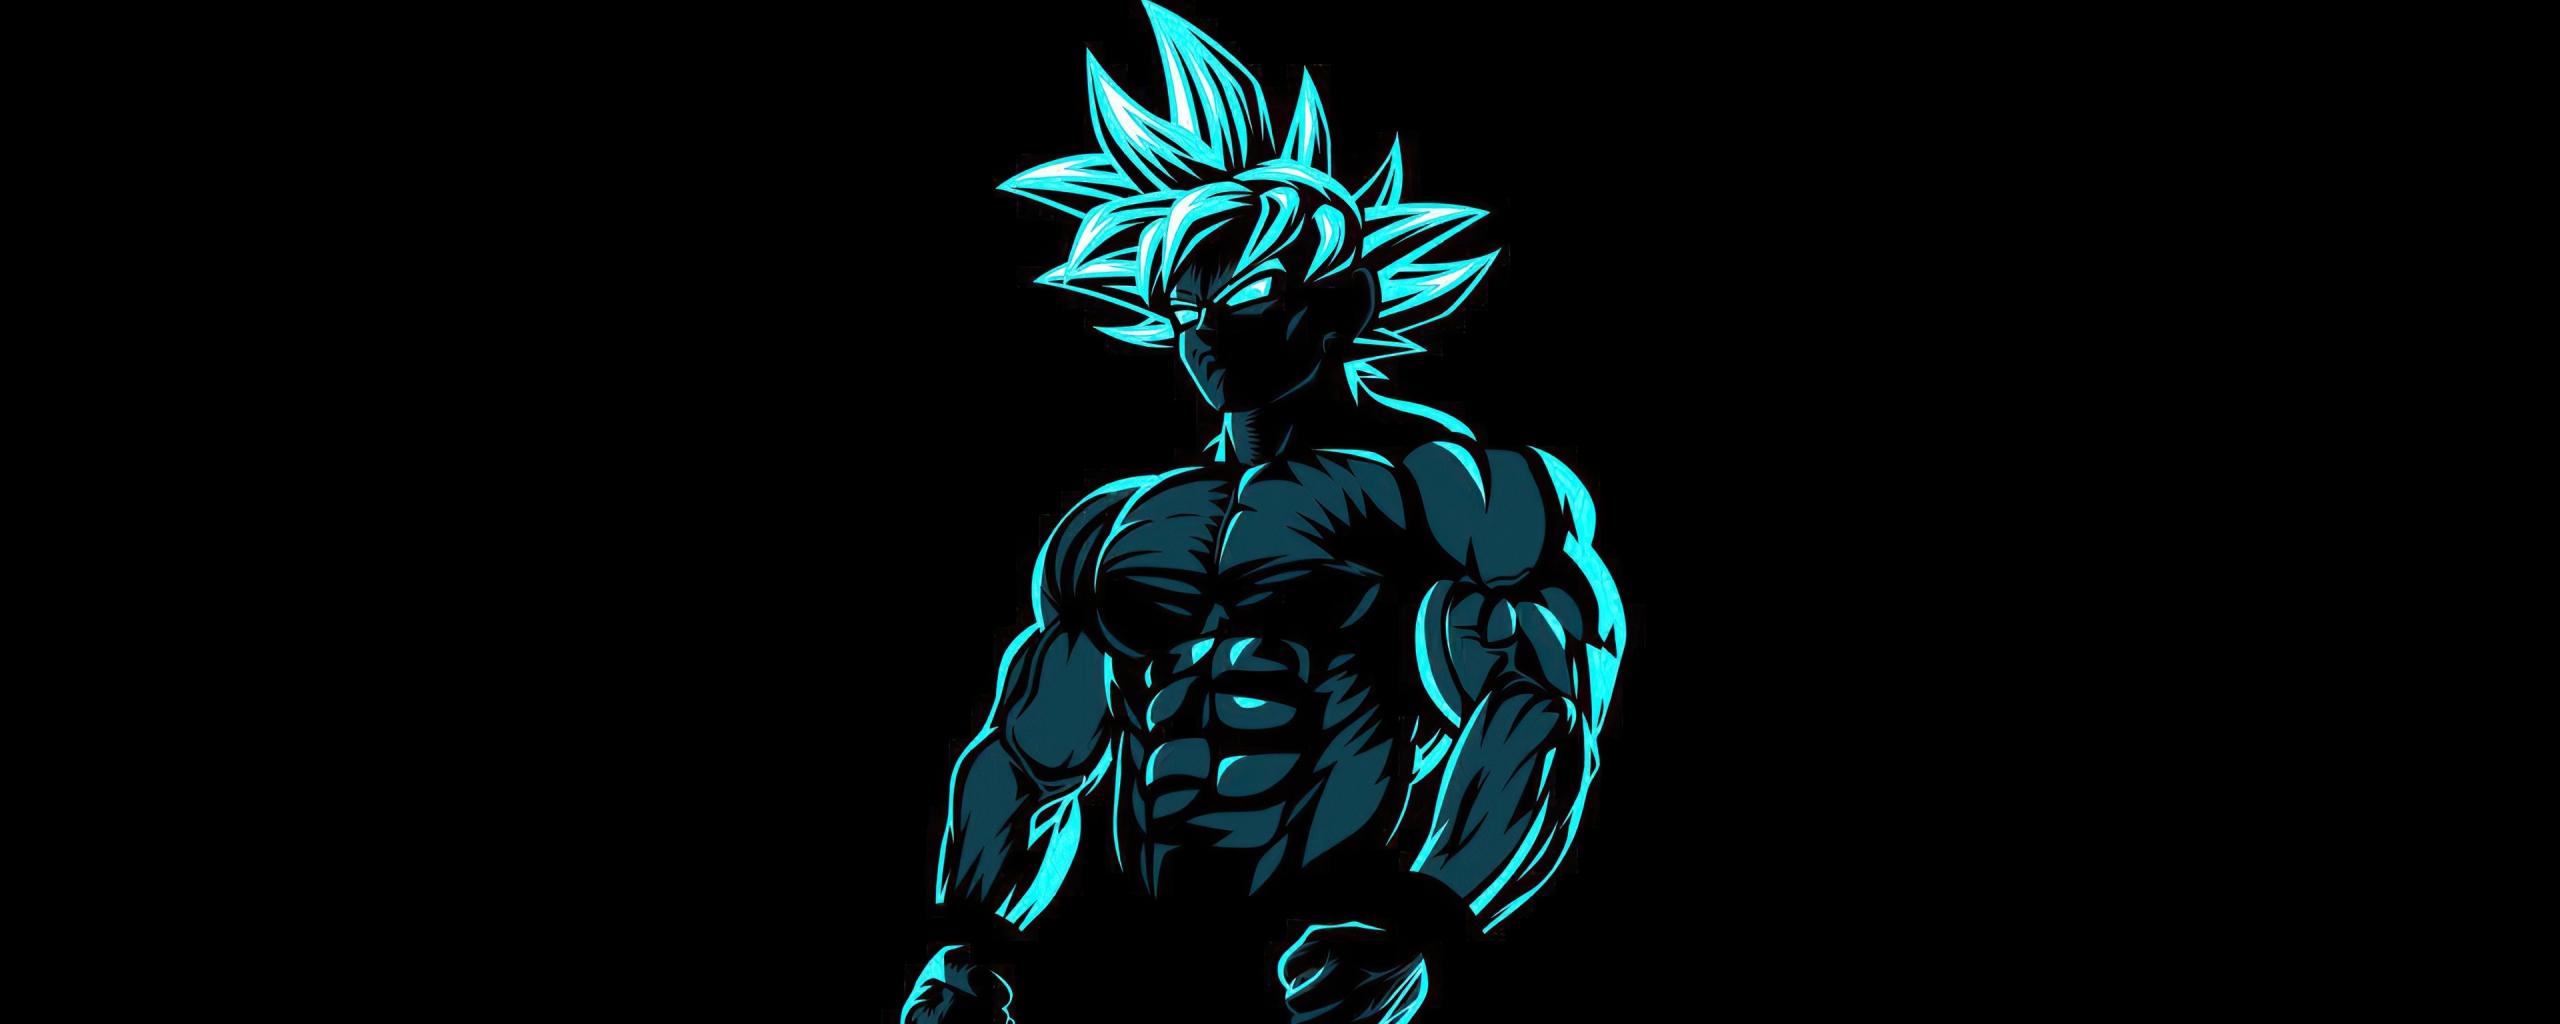 Desktop Wallpaper Anime Beast Goku Dark Hd Image Picture Background 303ae8